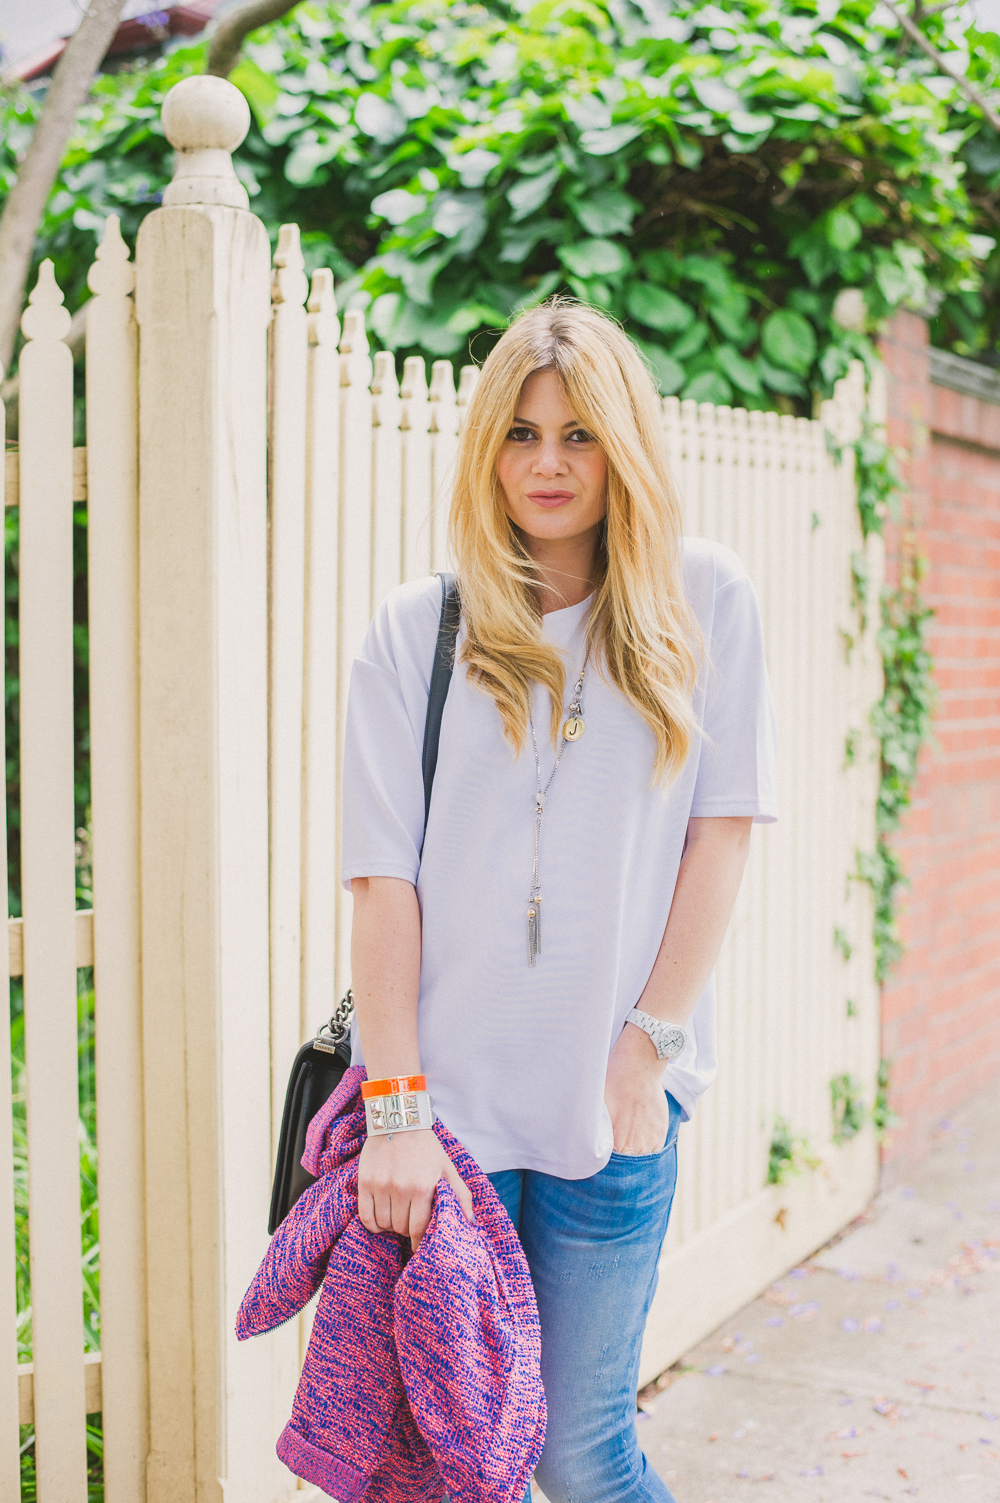 Australian Fashion Blog, Melbourne Blogger & Stylist - What Would Karl Do